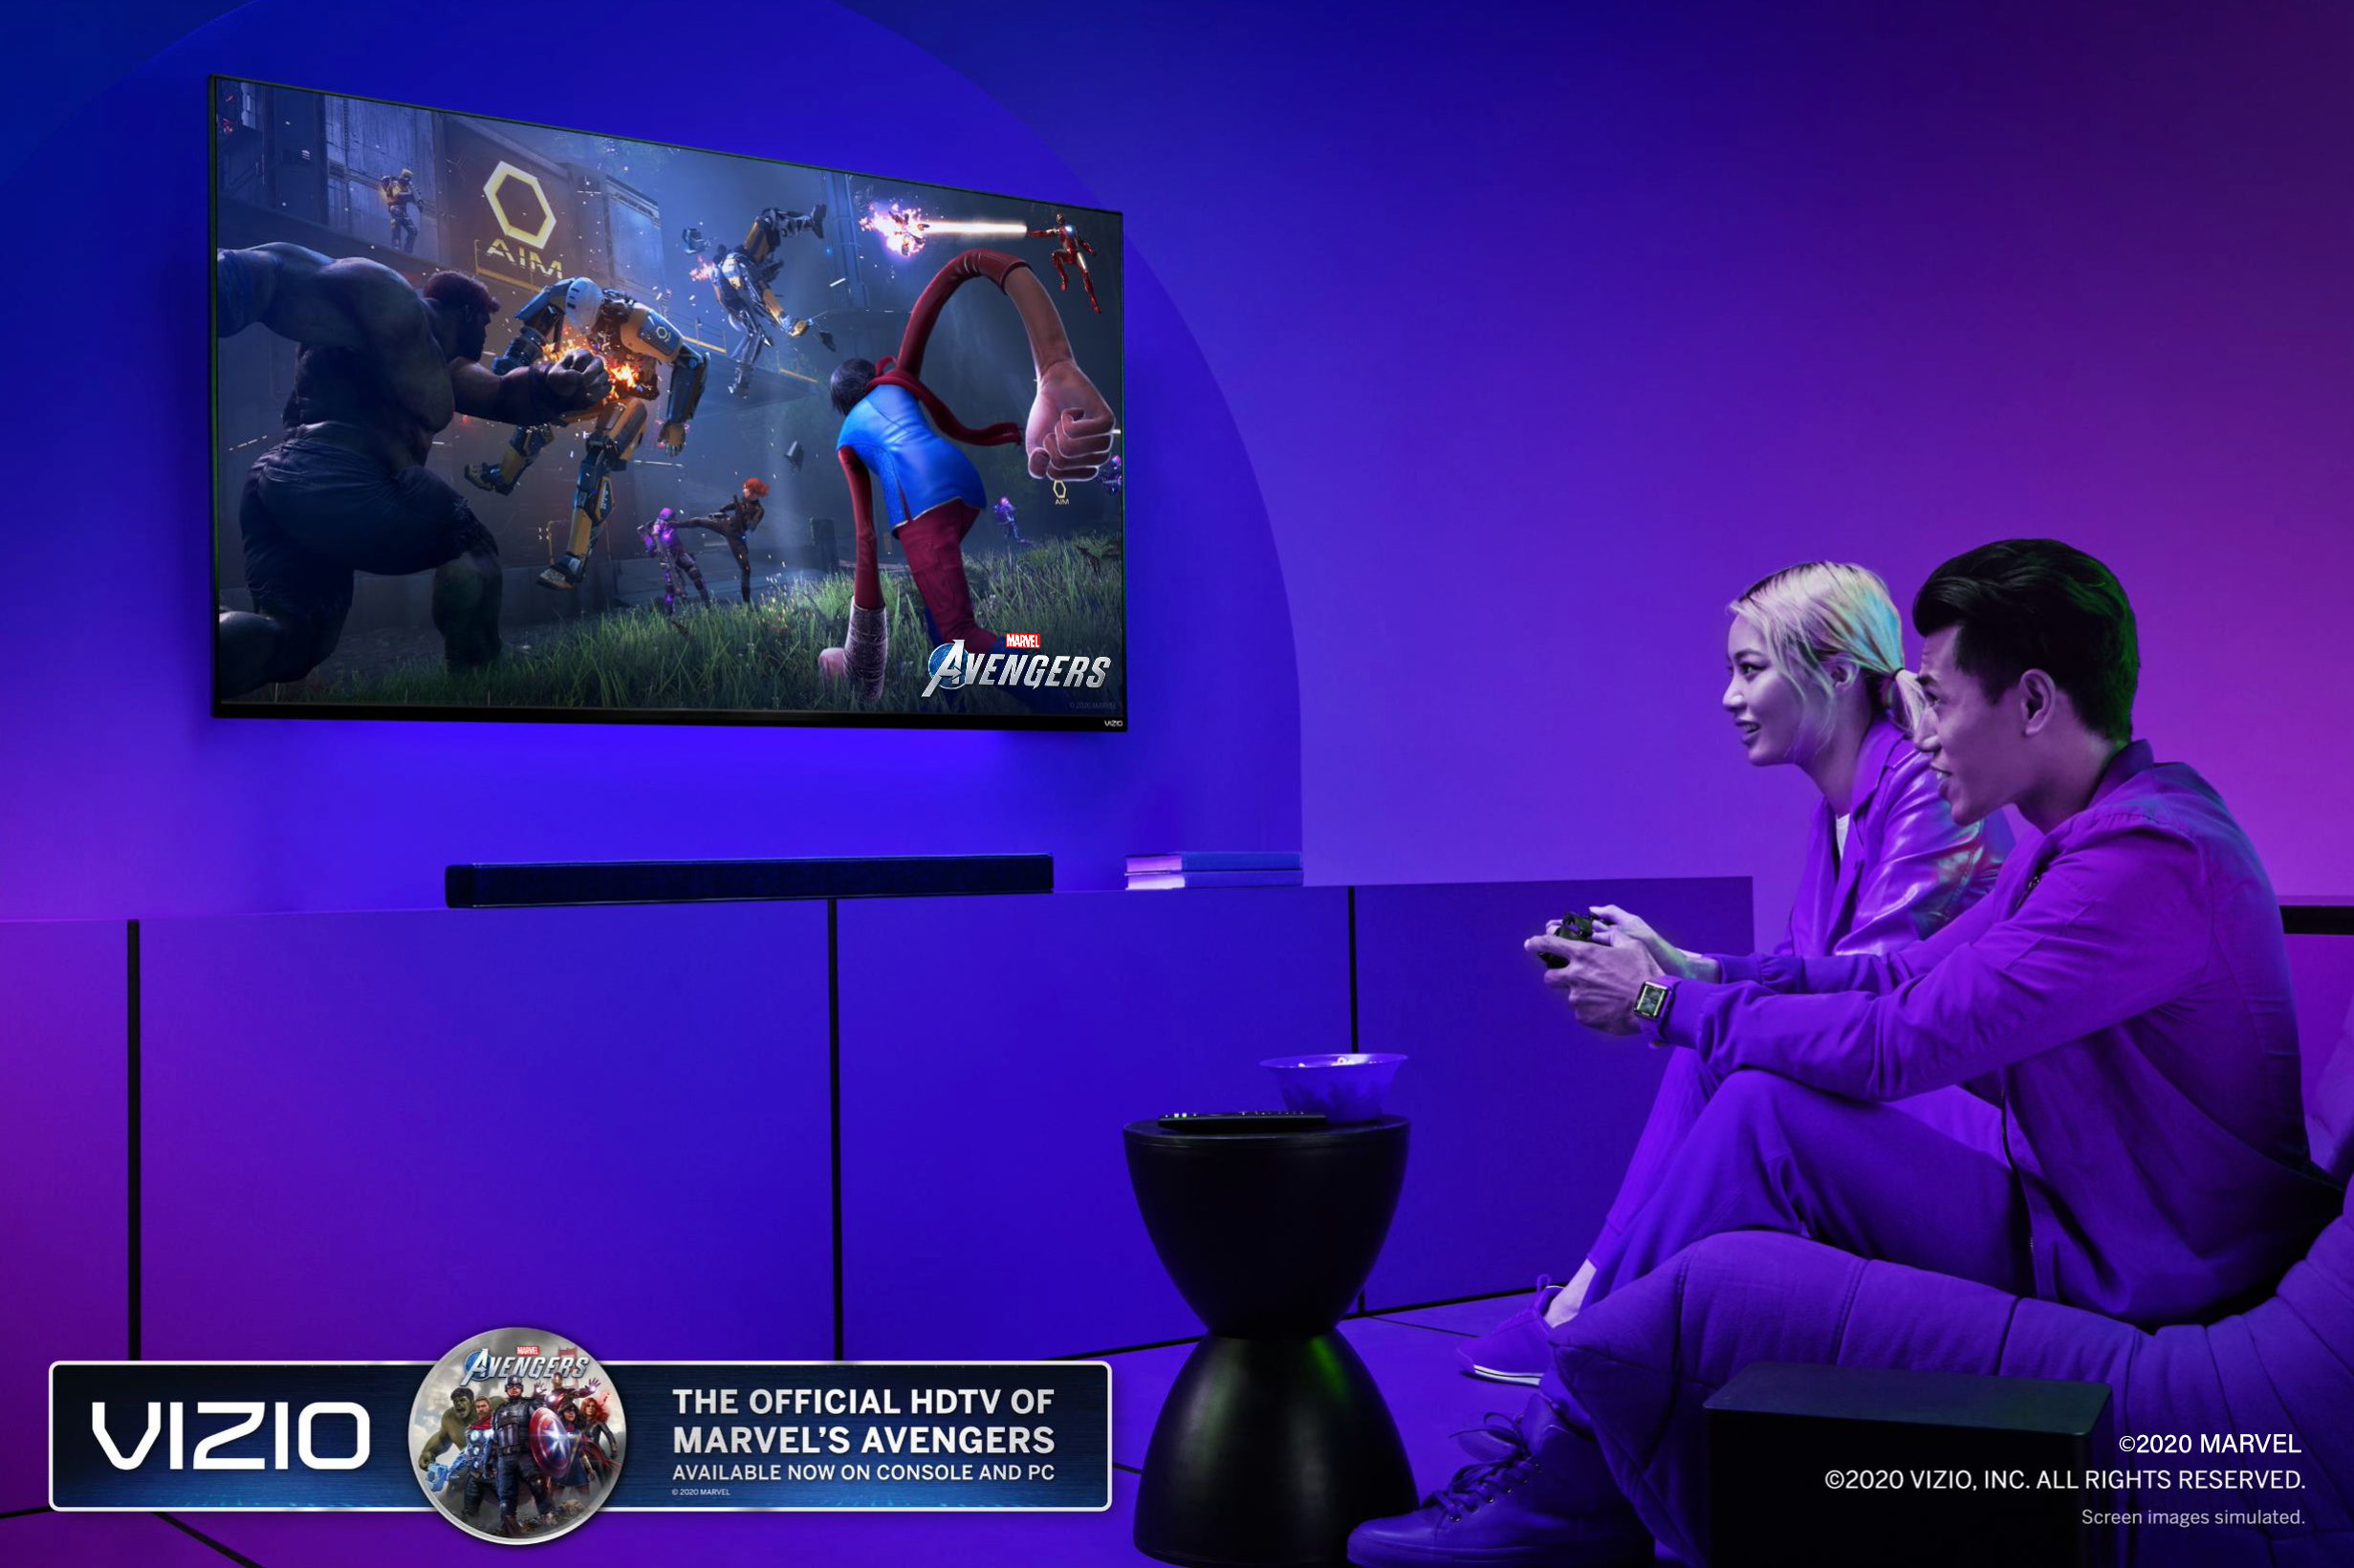 Vizio Marvels Avengers Screen